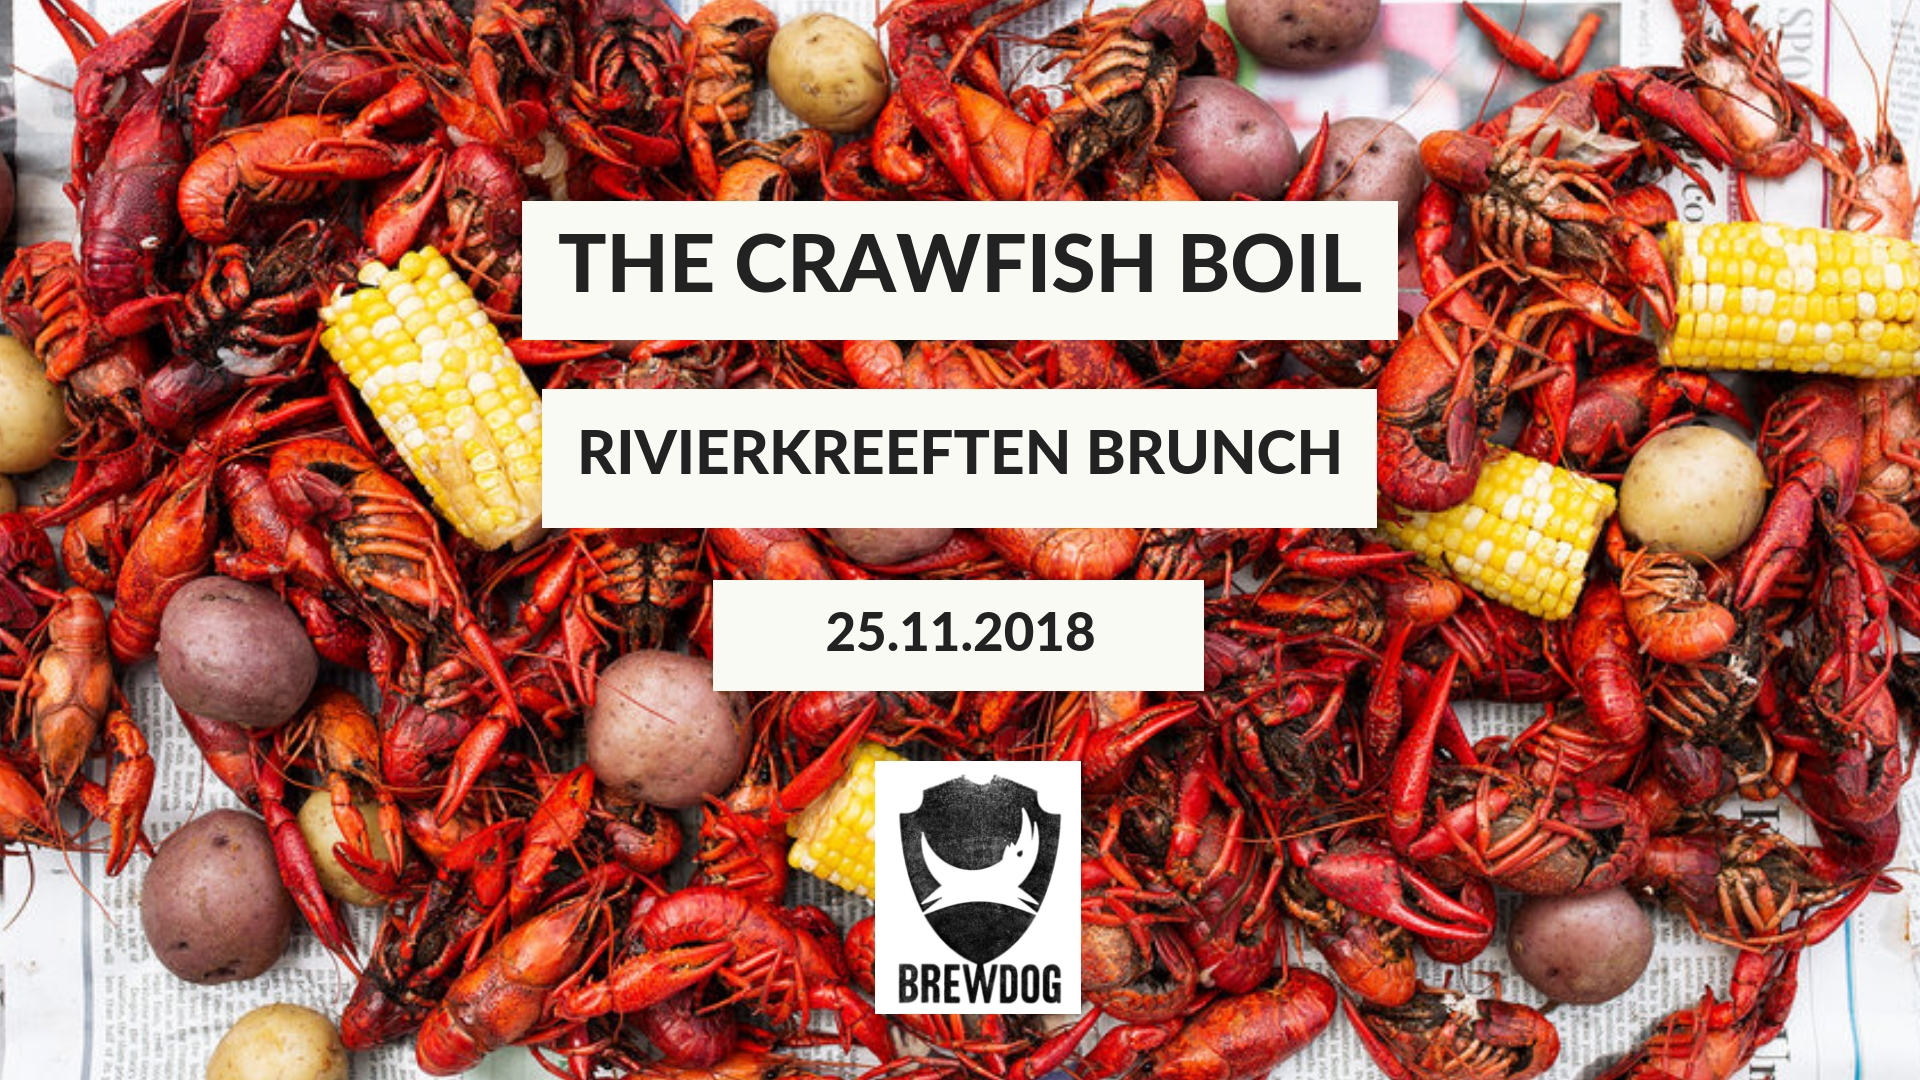 CrawfishBoil.jpg